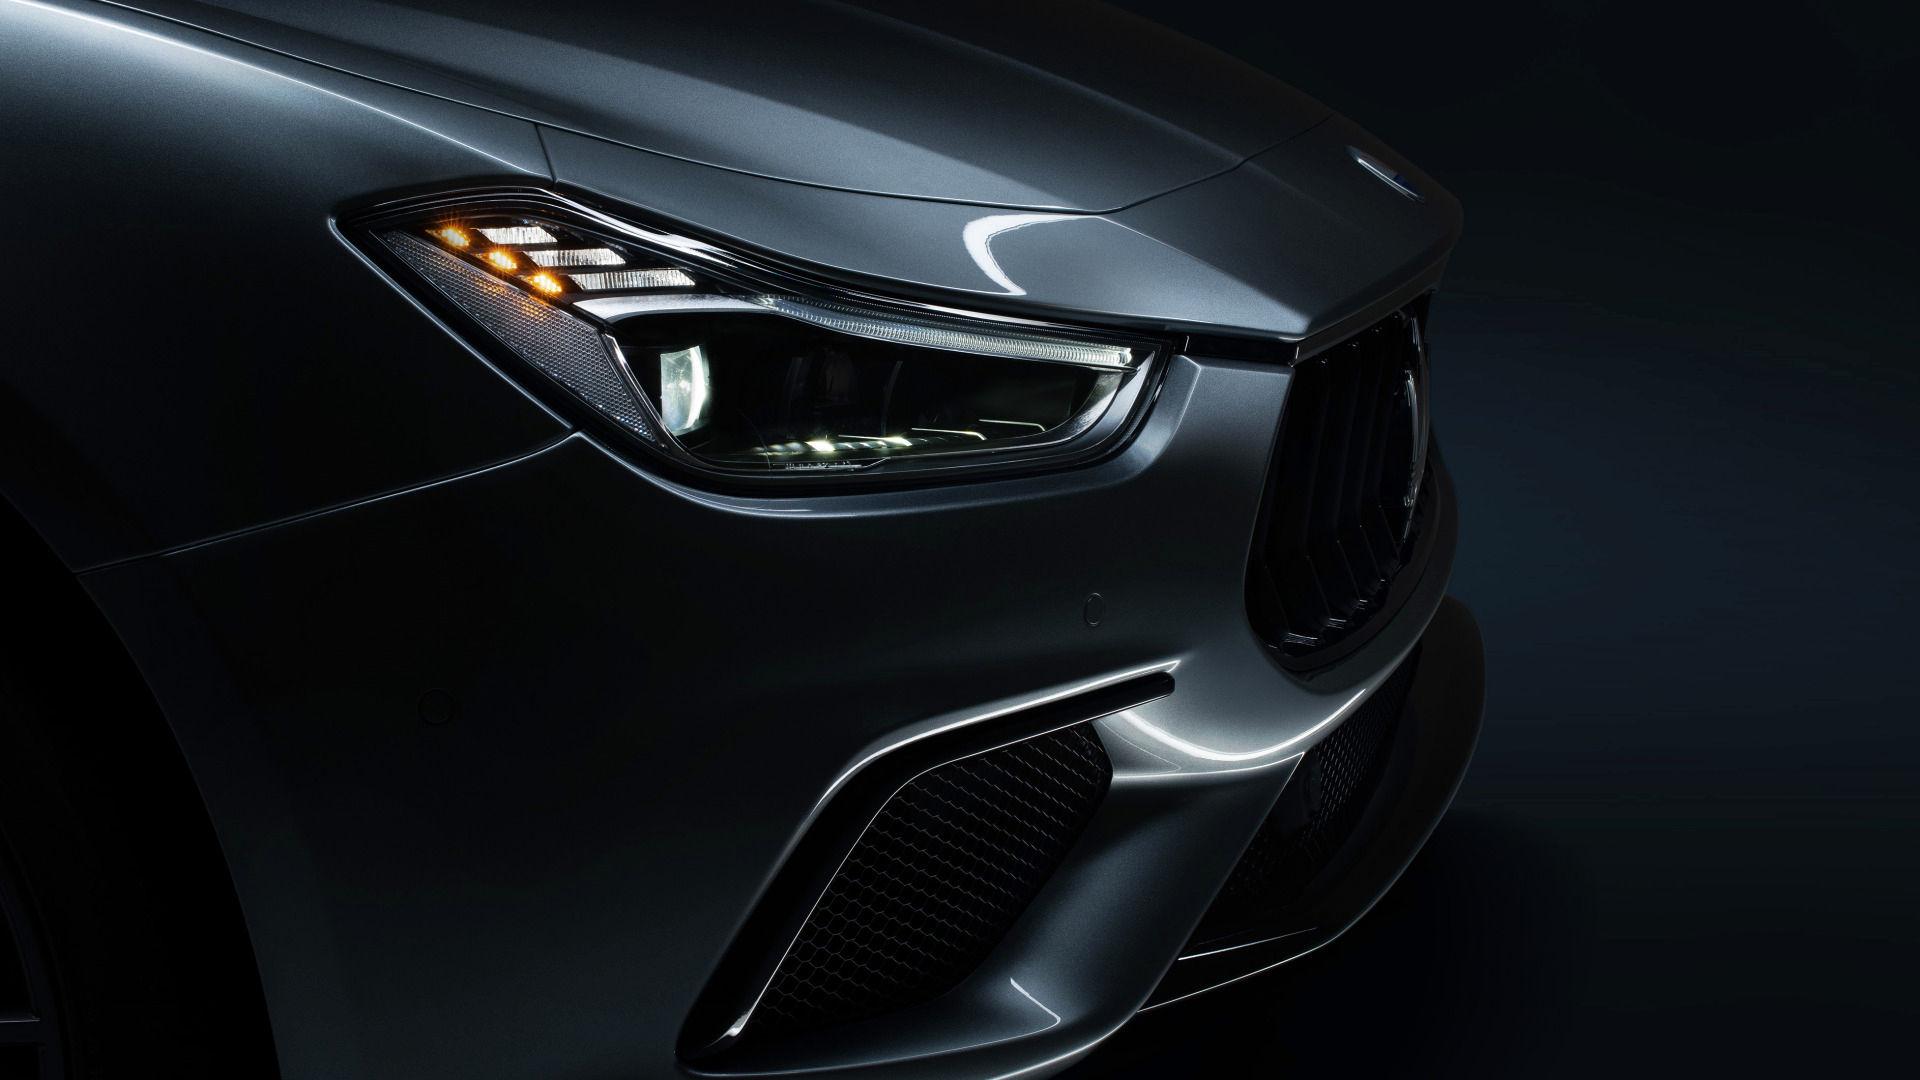 Maserati Ghibli - Grau - Kühlergrill und Scheinwerfer